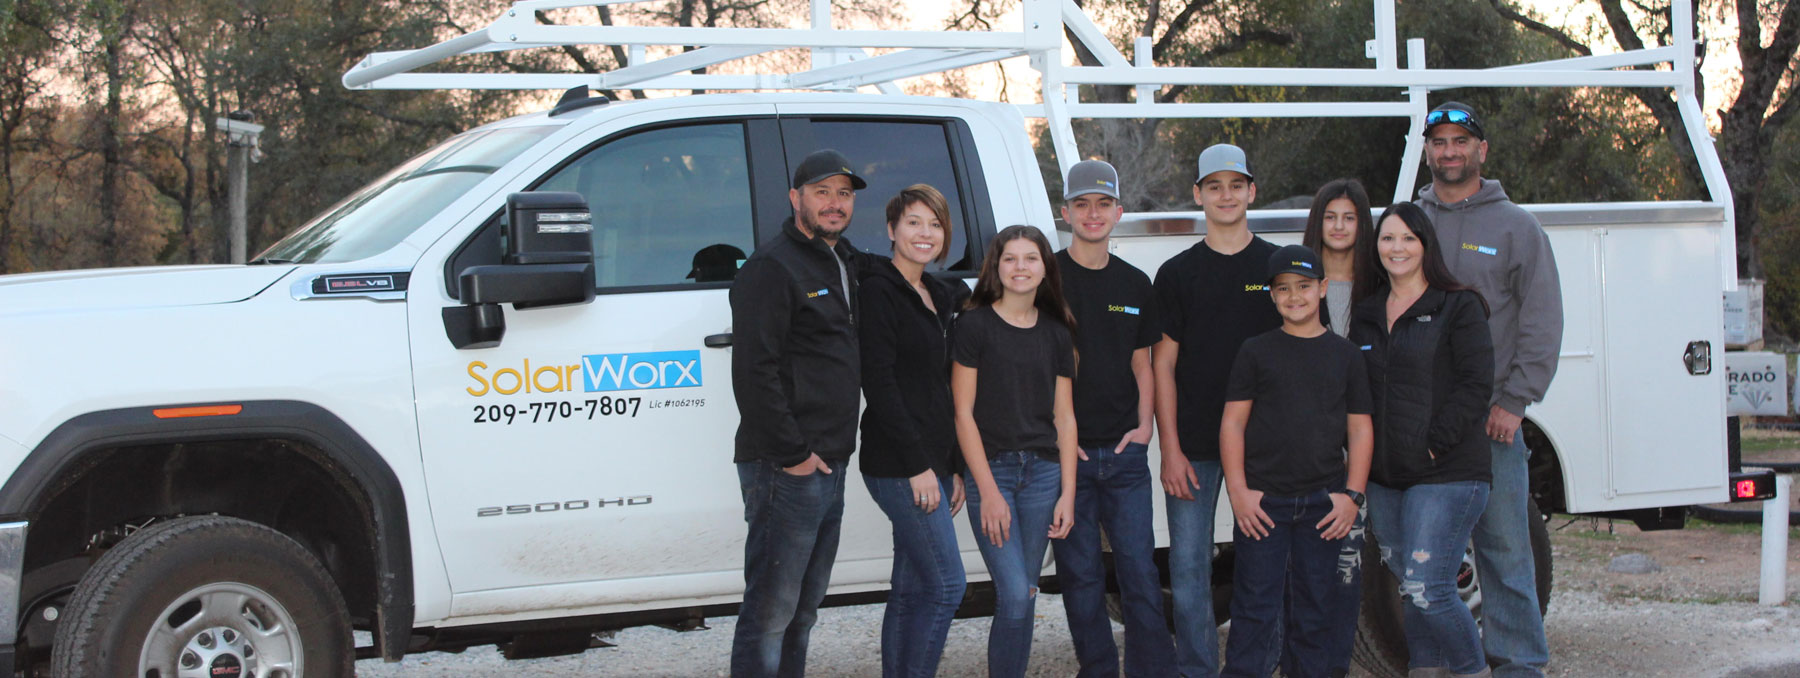 SolarWorx Energy family in Tuolumne County California. Your local solar panel installation professionals